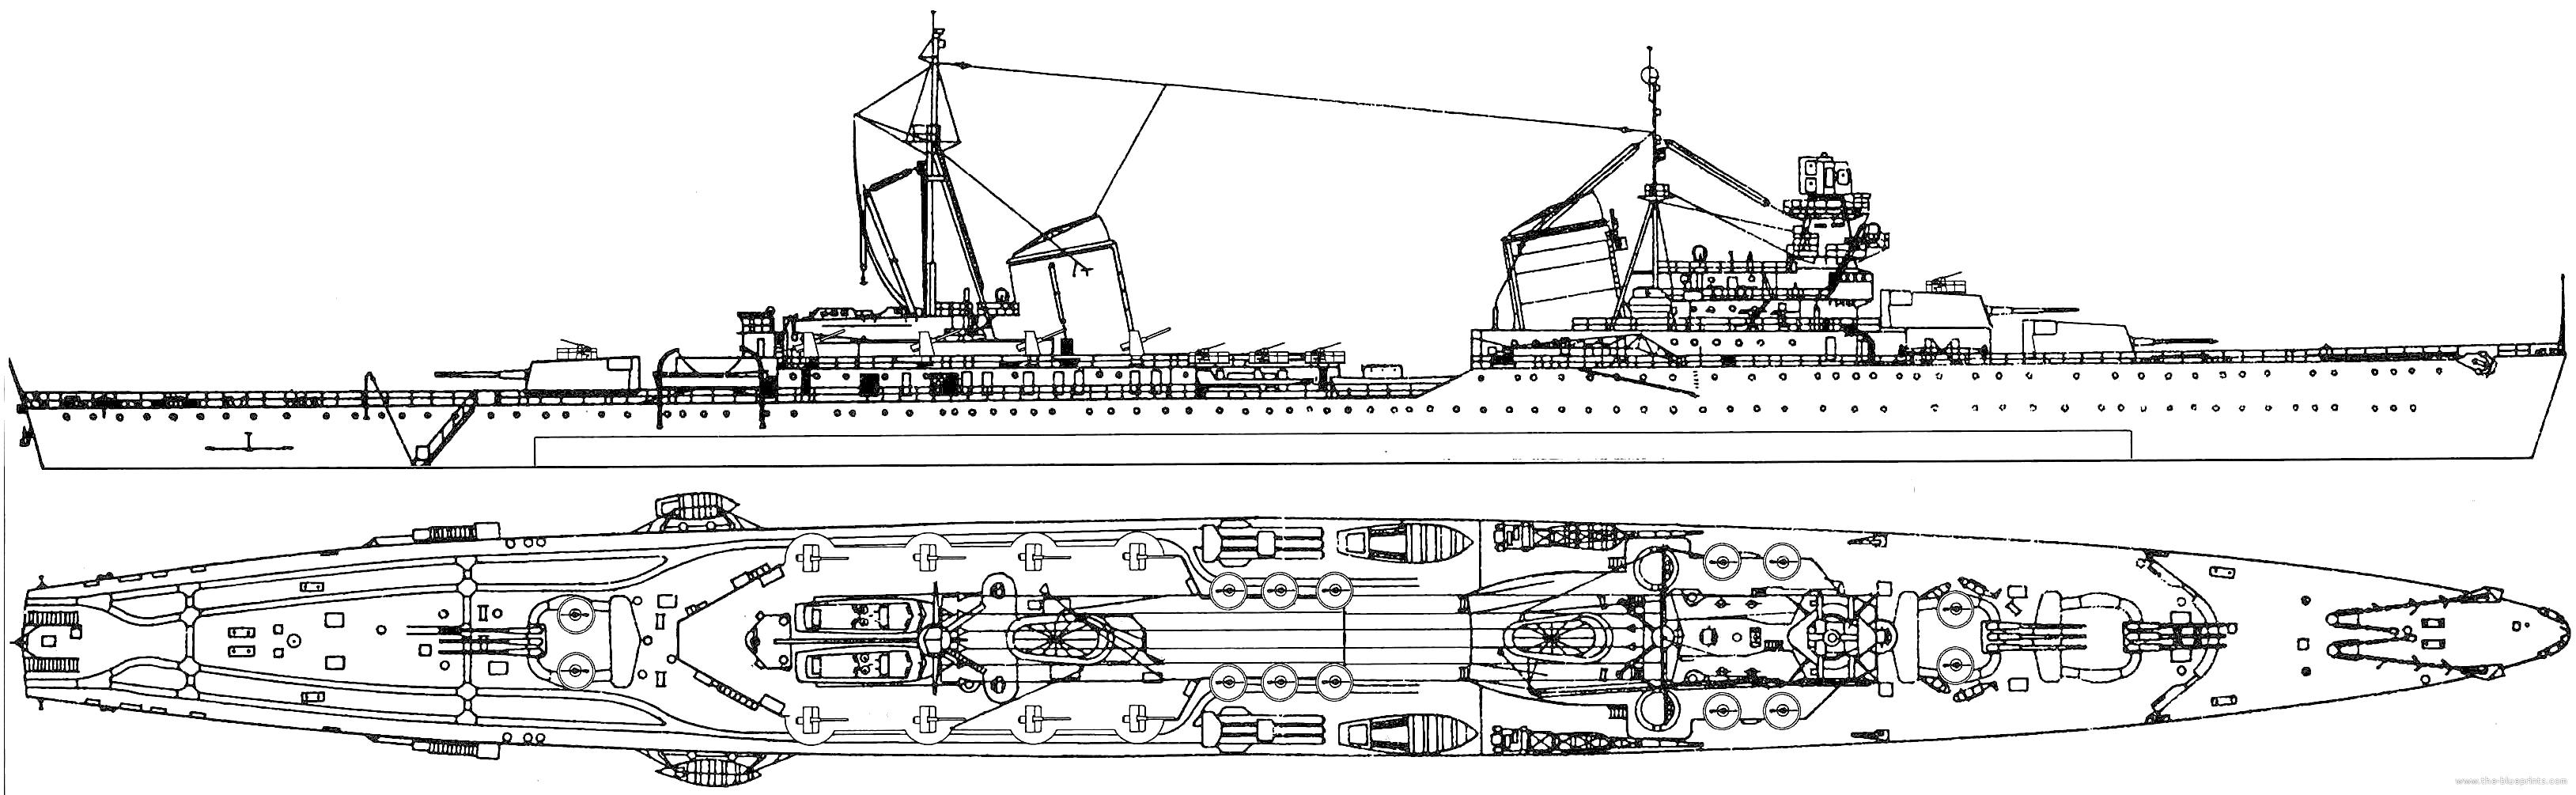 drawing courtesy of httpwwwthe blueprintscom class and type kirov class cruiser displacement 8400 tonnes 8267 long tons standard